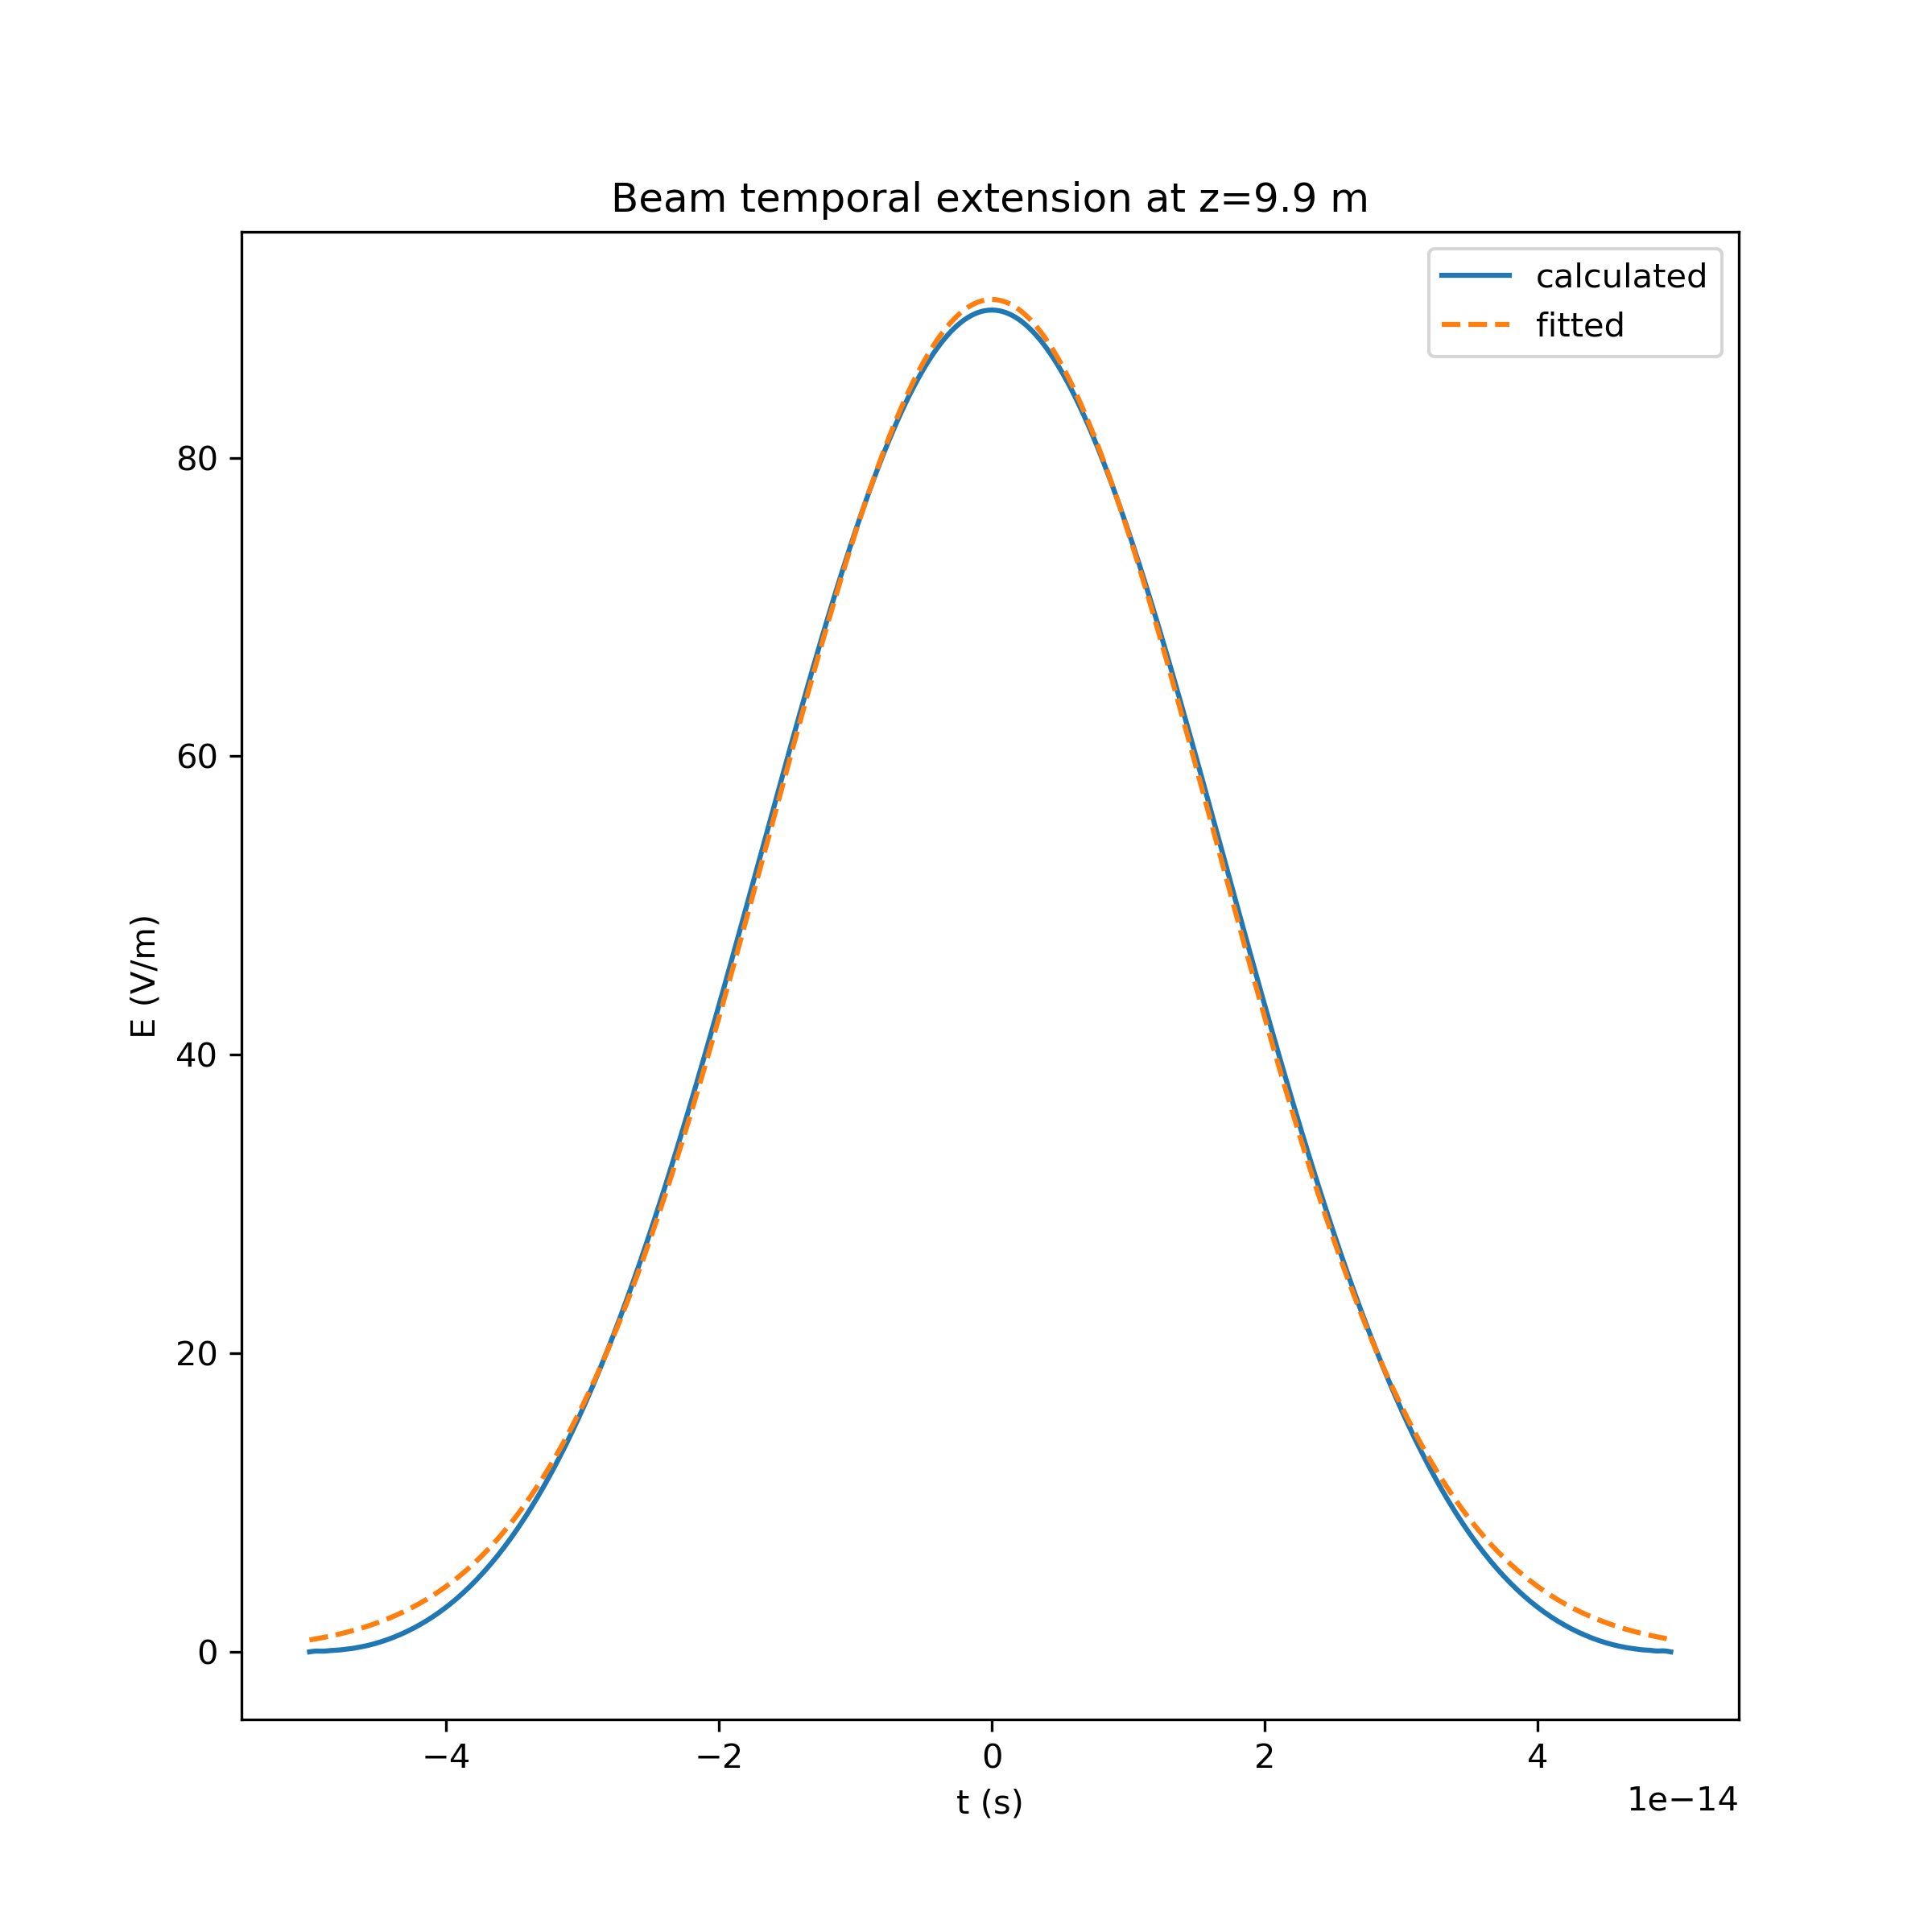 figures/HSCN/temp_fit_end.png